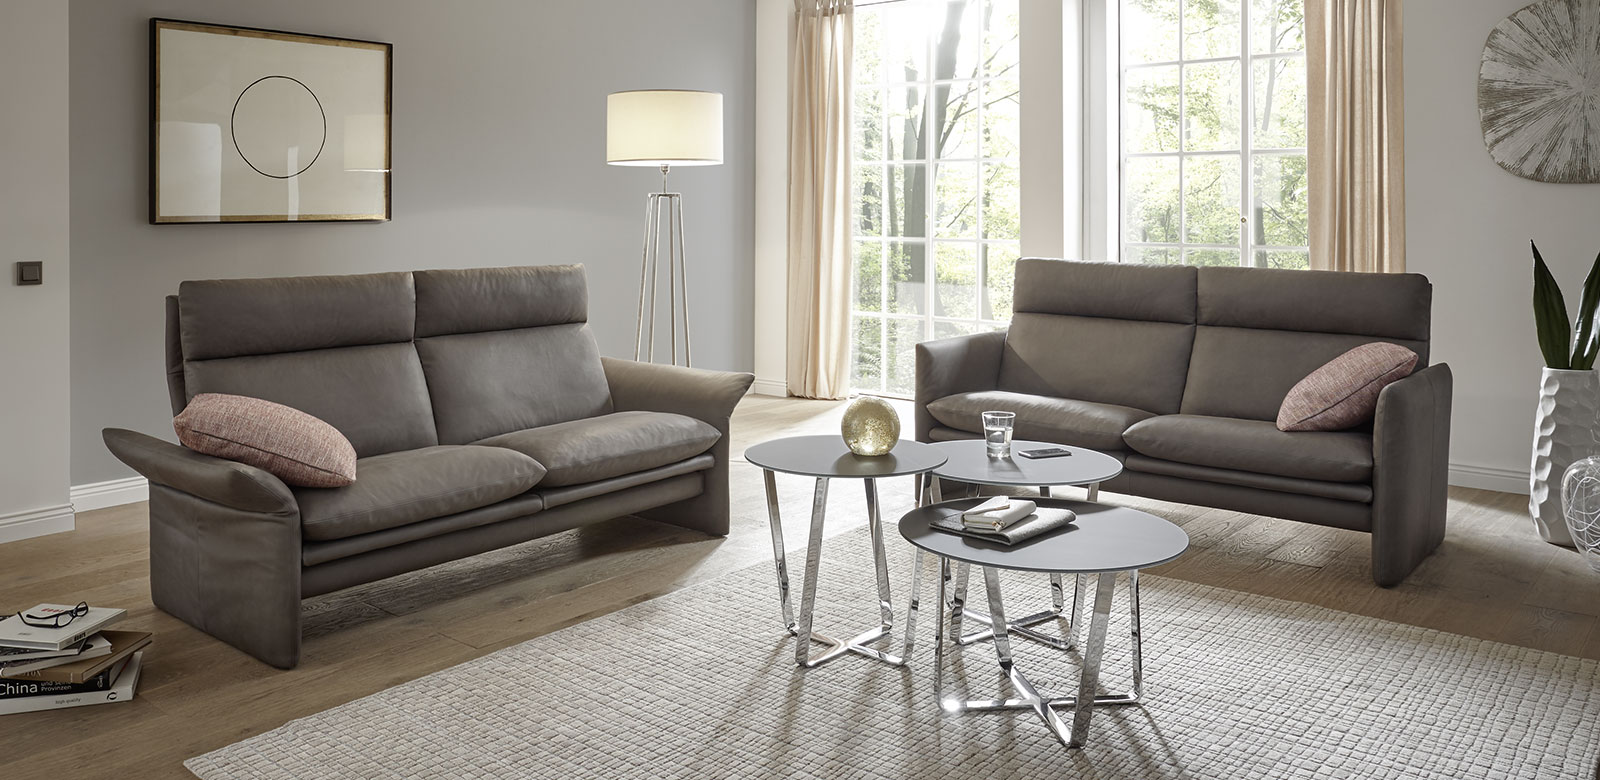 bequemlichkeit passt berall hin relaxsofa cuneo. Black Bedroom Furniture Sets. Home Design Ideas